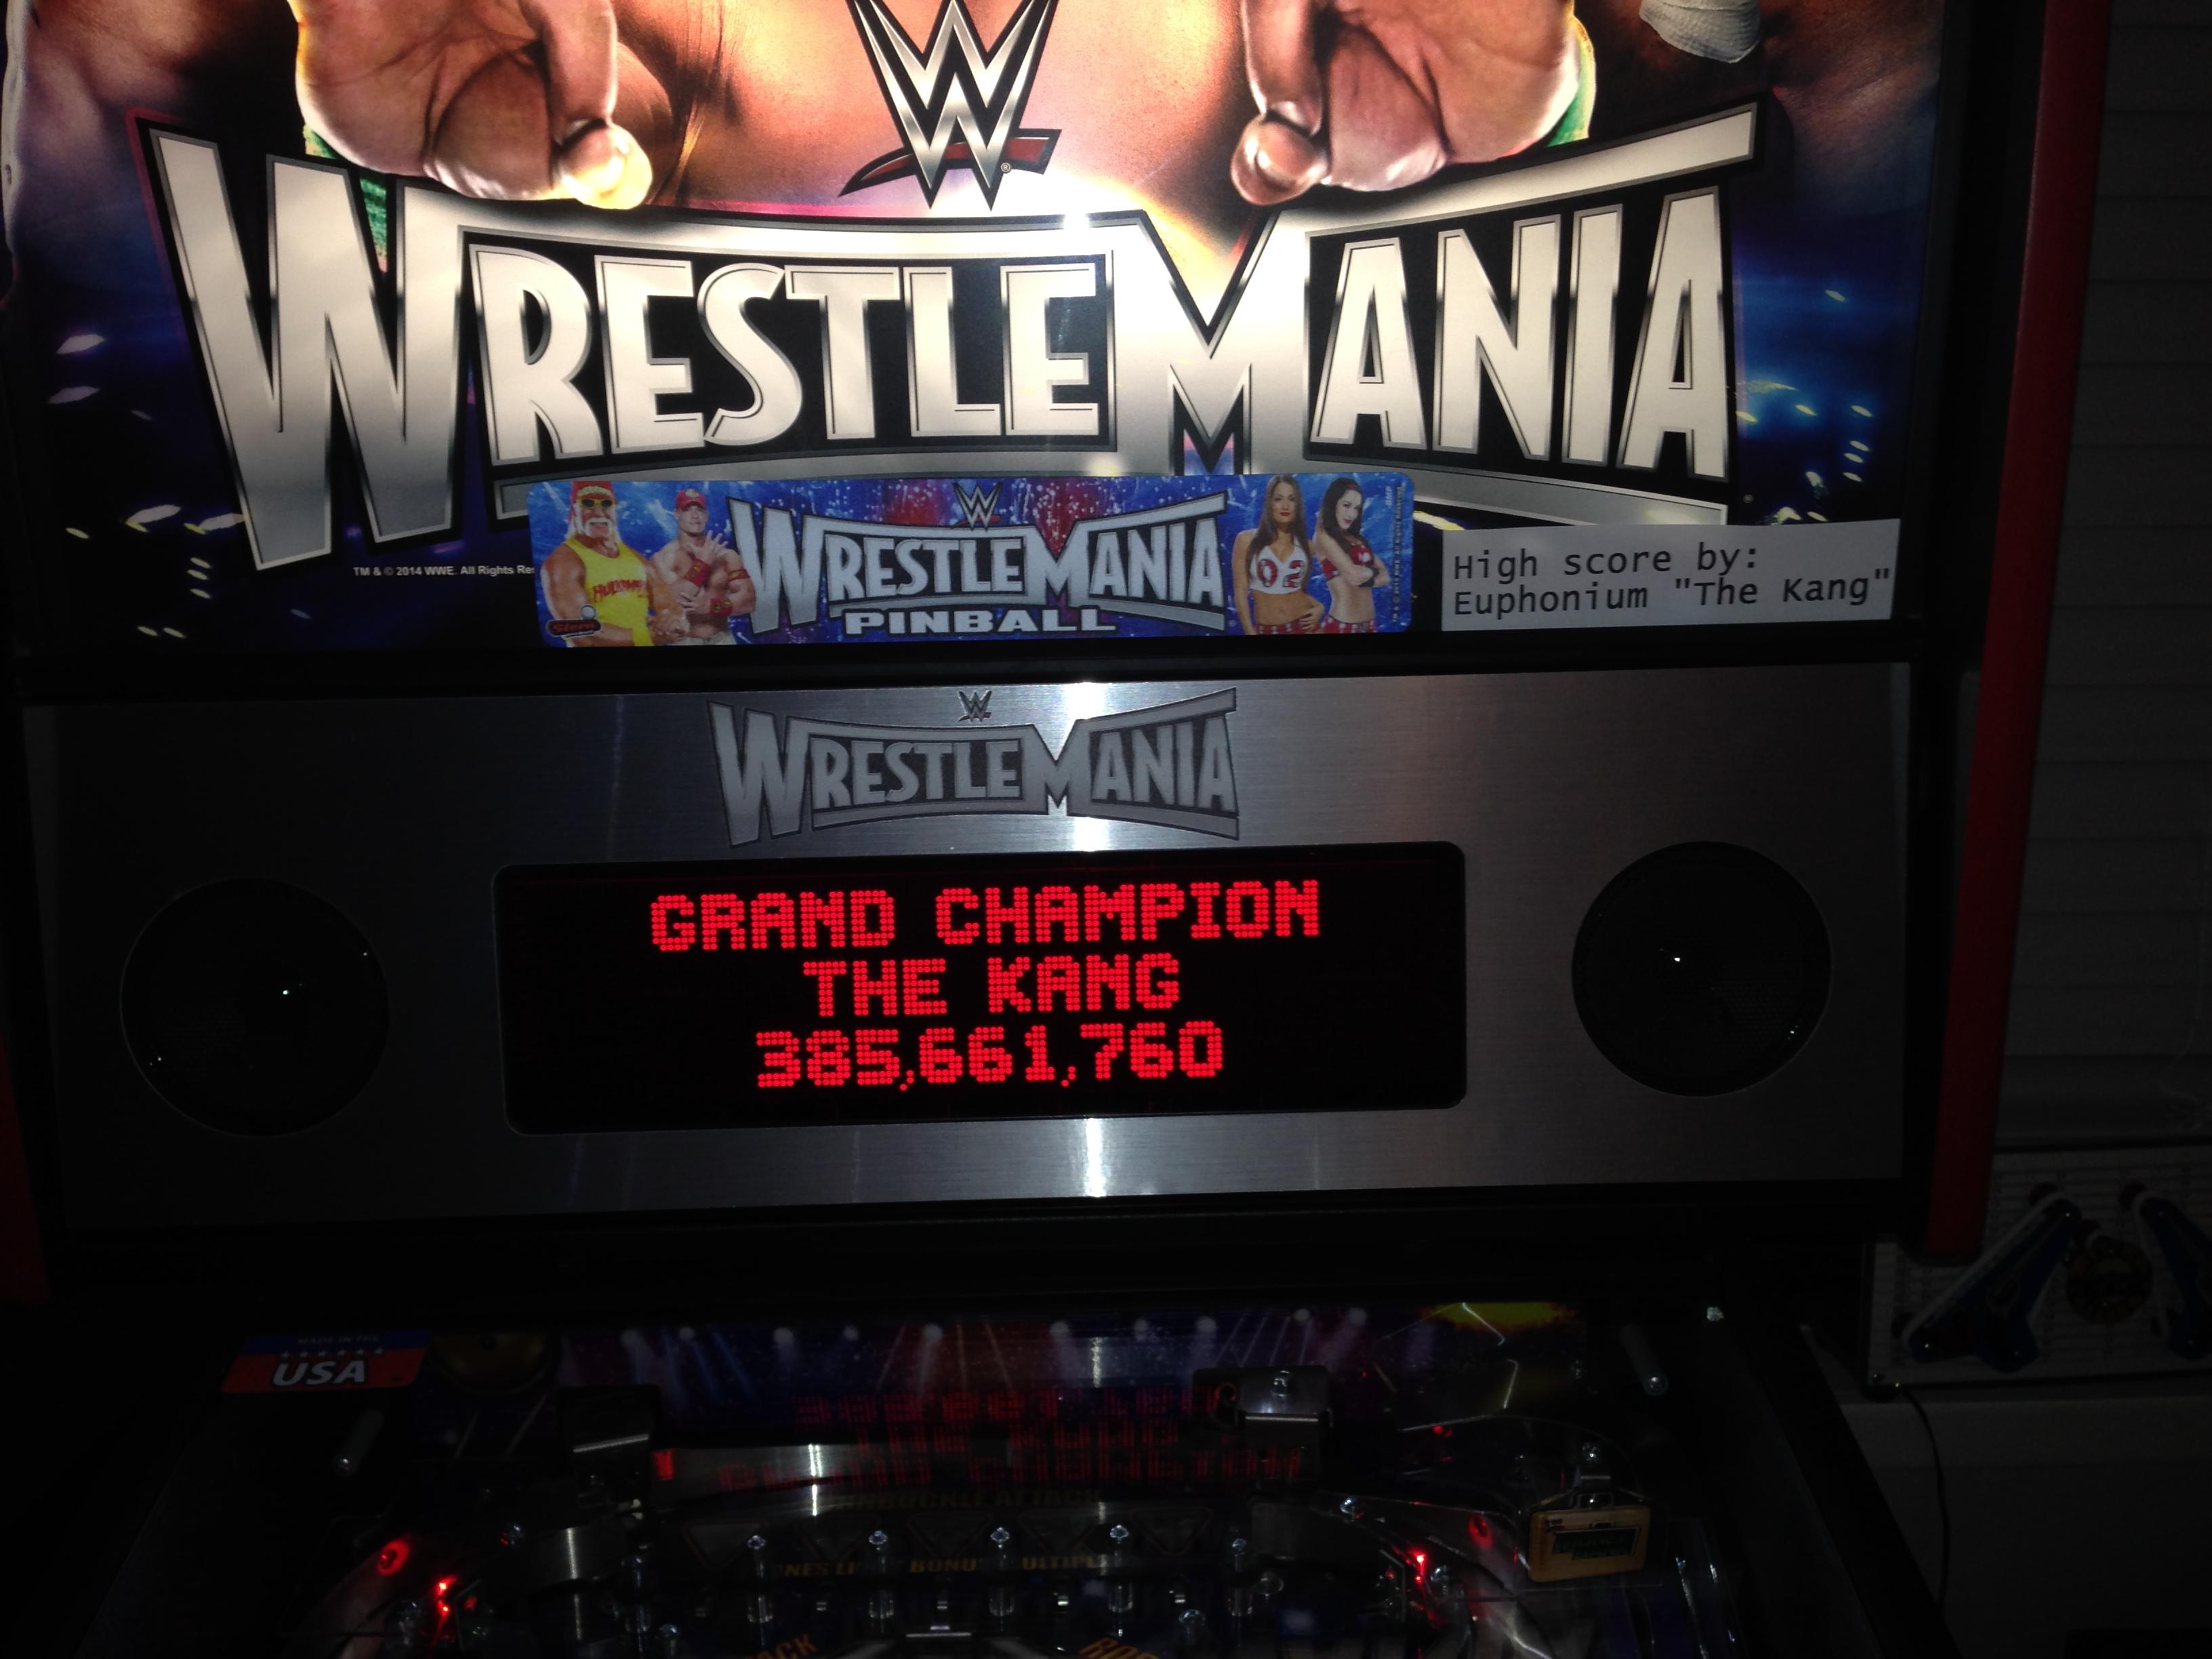 euphonium: WWE Wrestlemania (Pinball: 3 Balls) 385,661,760 points on 2016-05-16 00:02:50